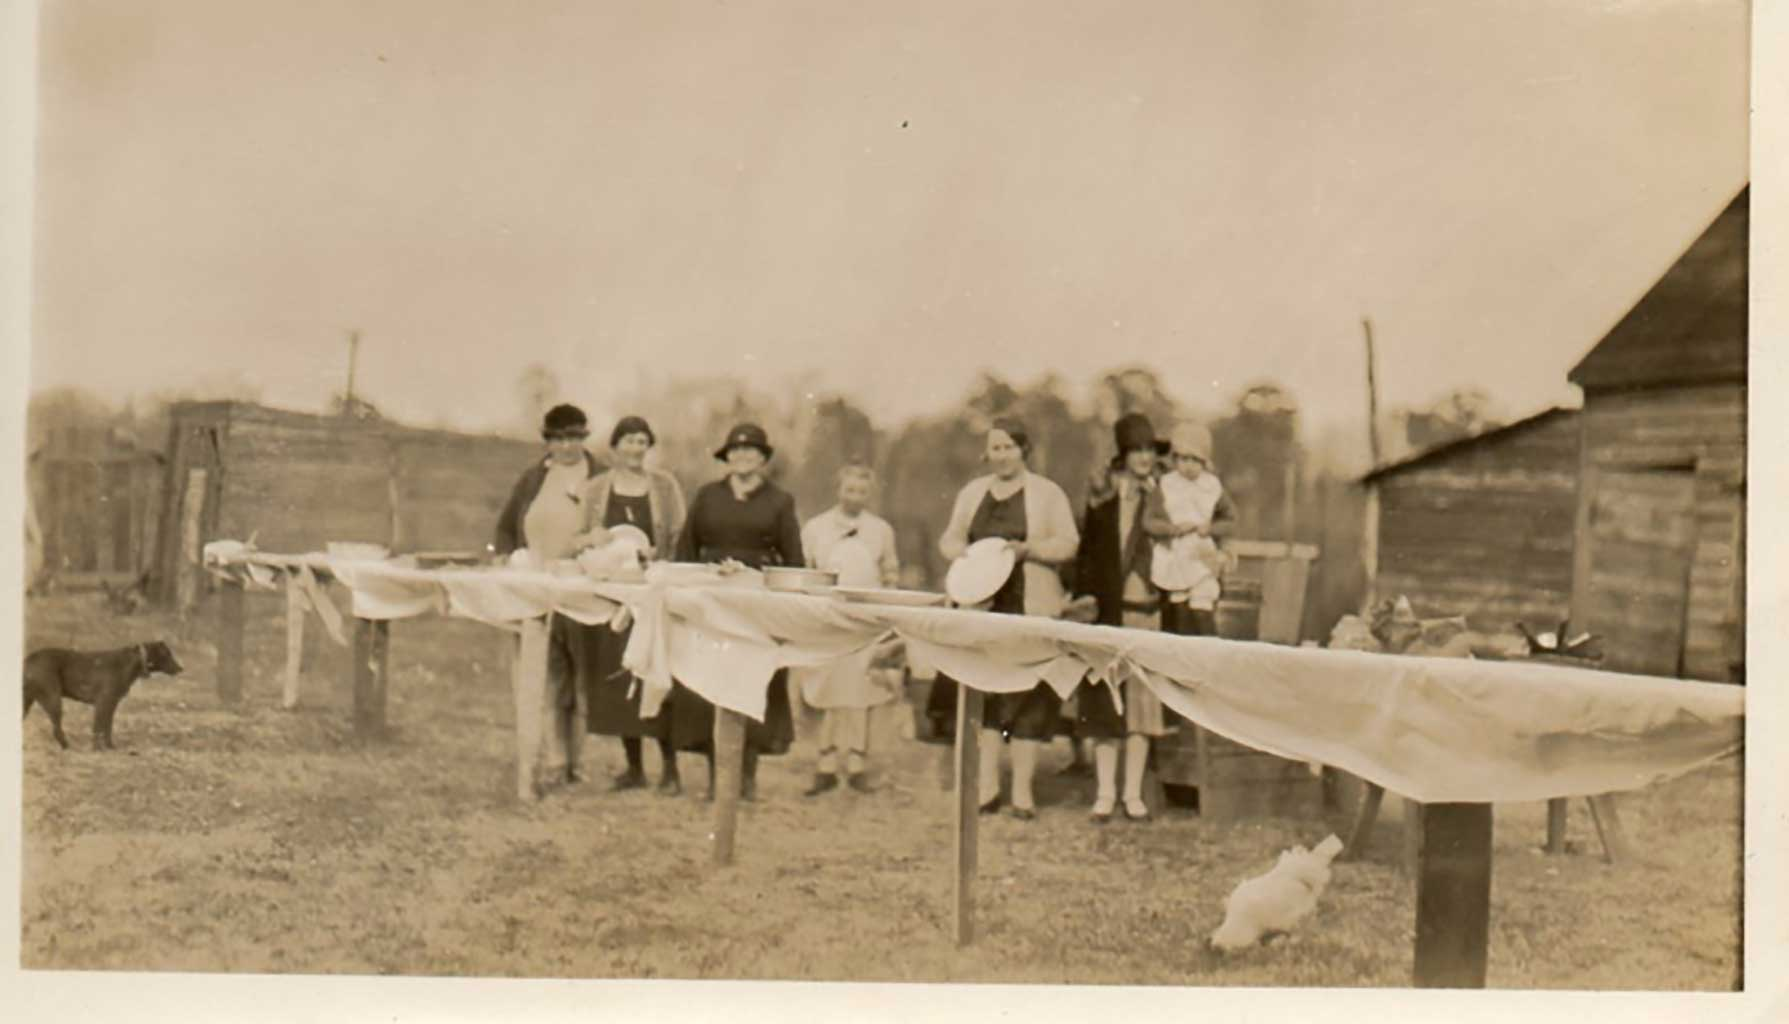 ladies-preparing-lunch-for-fox-hunters-img345